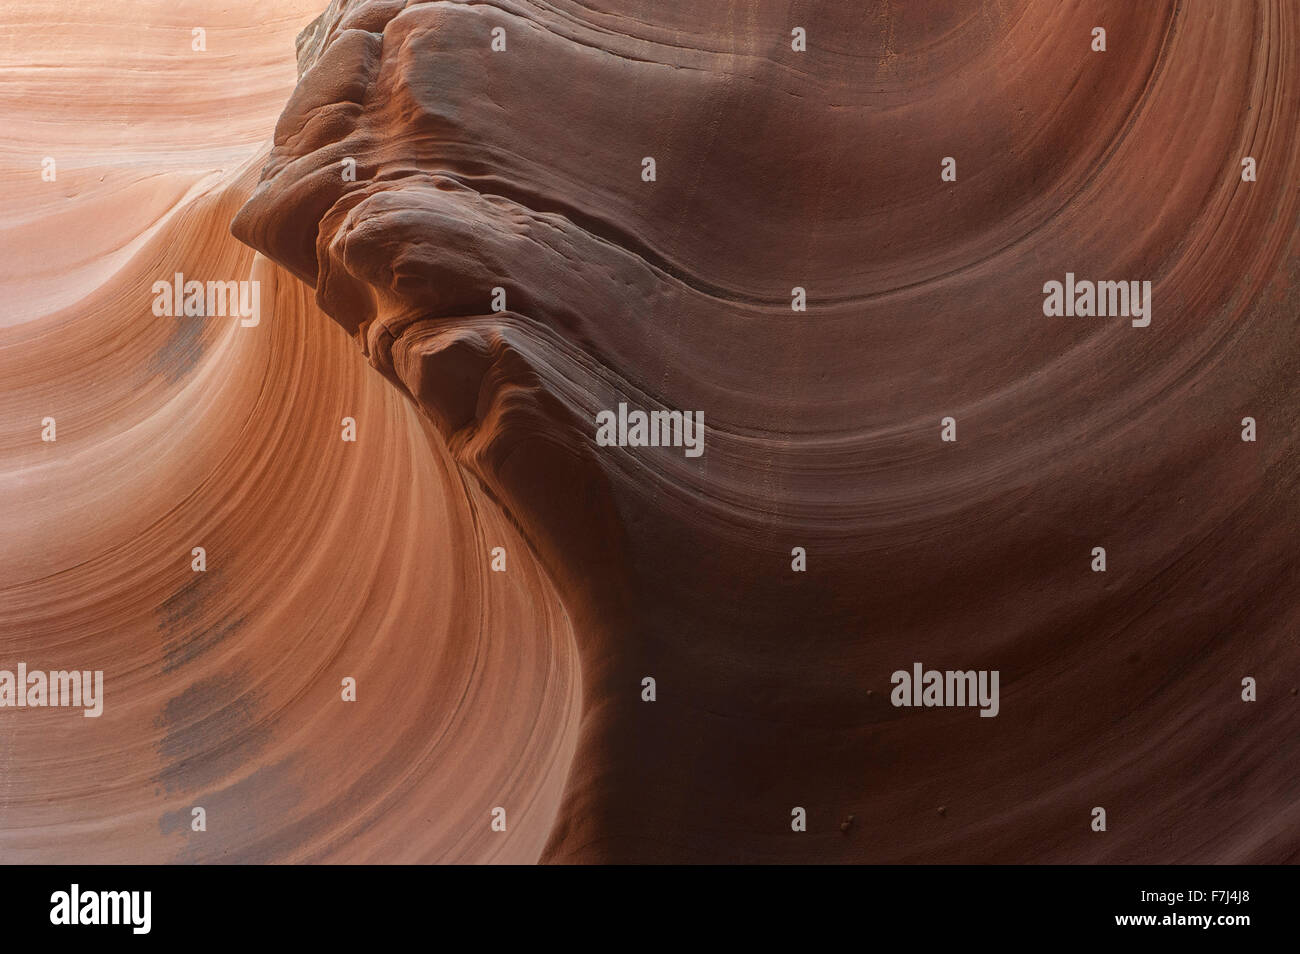 Swirled patterns on sandstone created by erosion Stock Photo